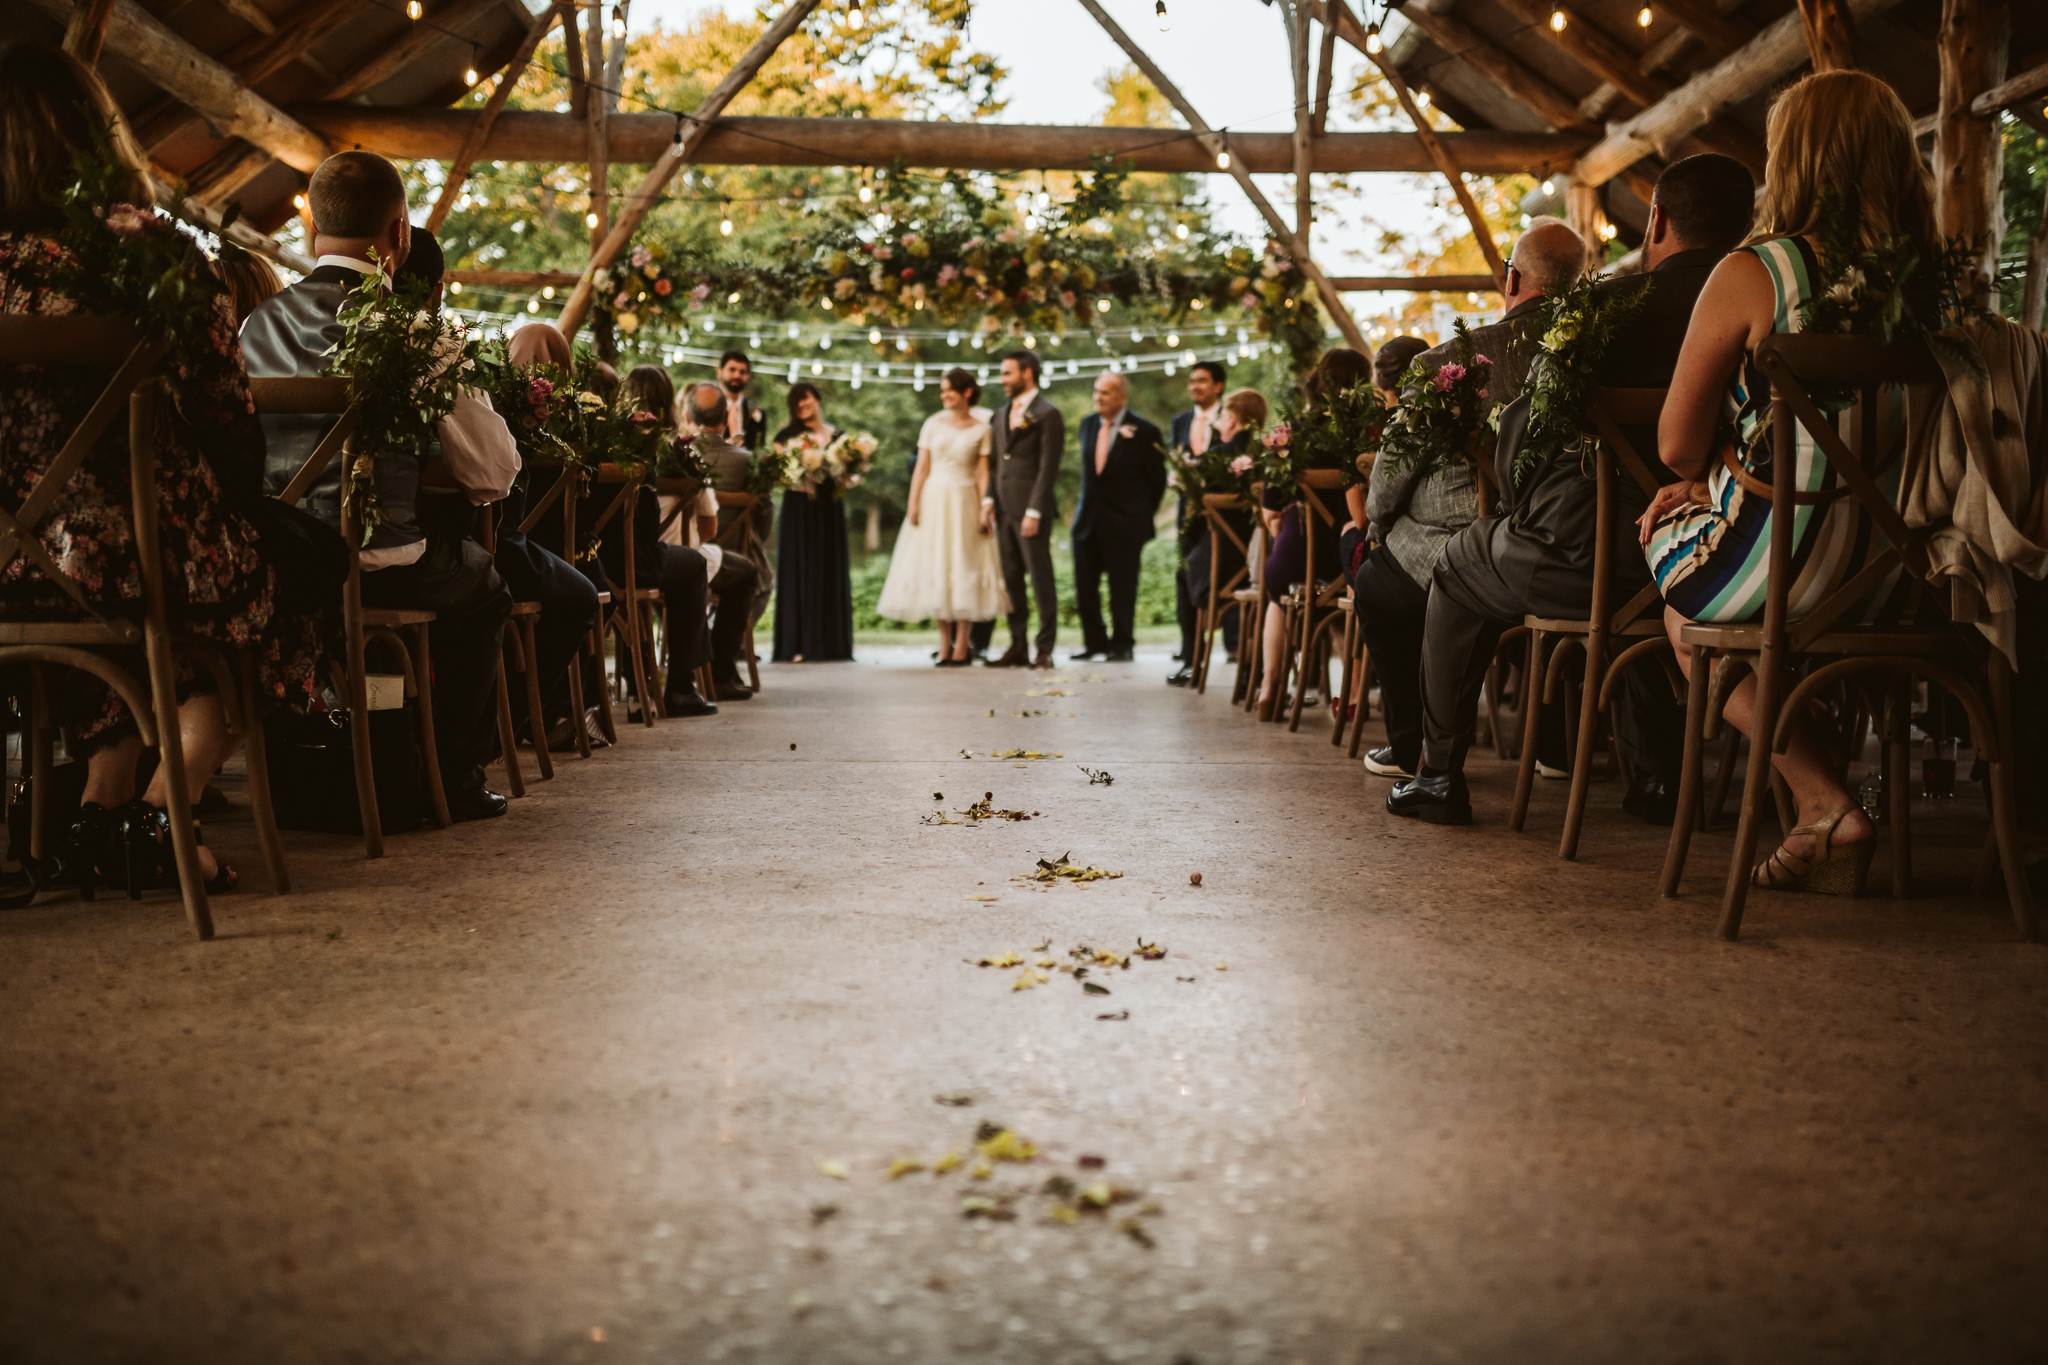 Wollam_gardens_wedding49.JPG